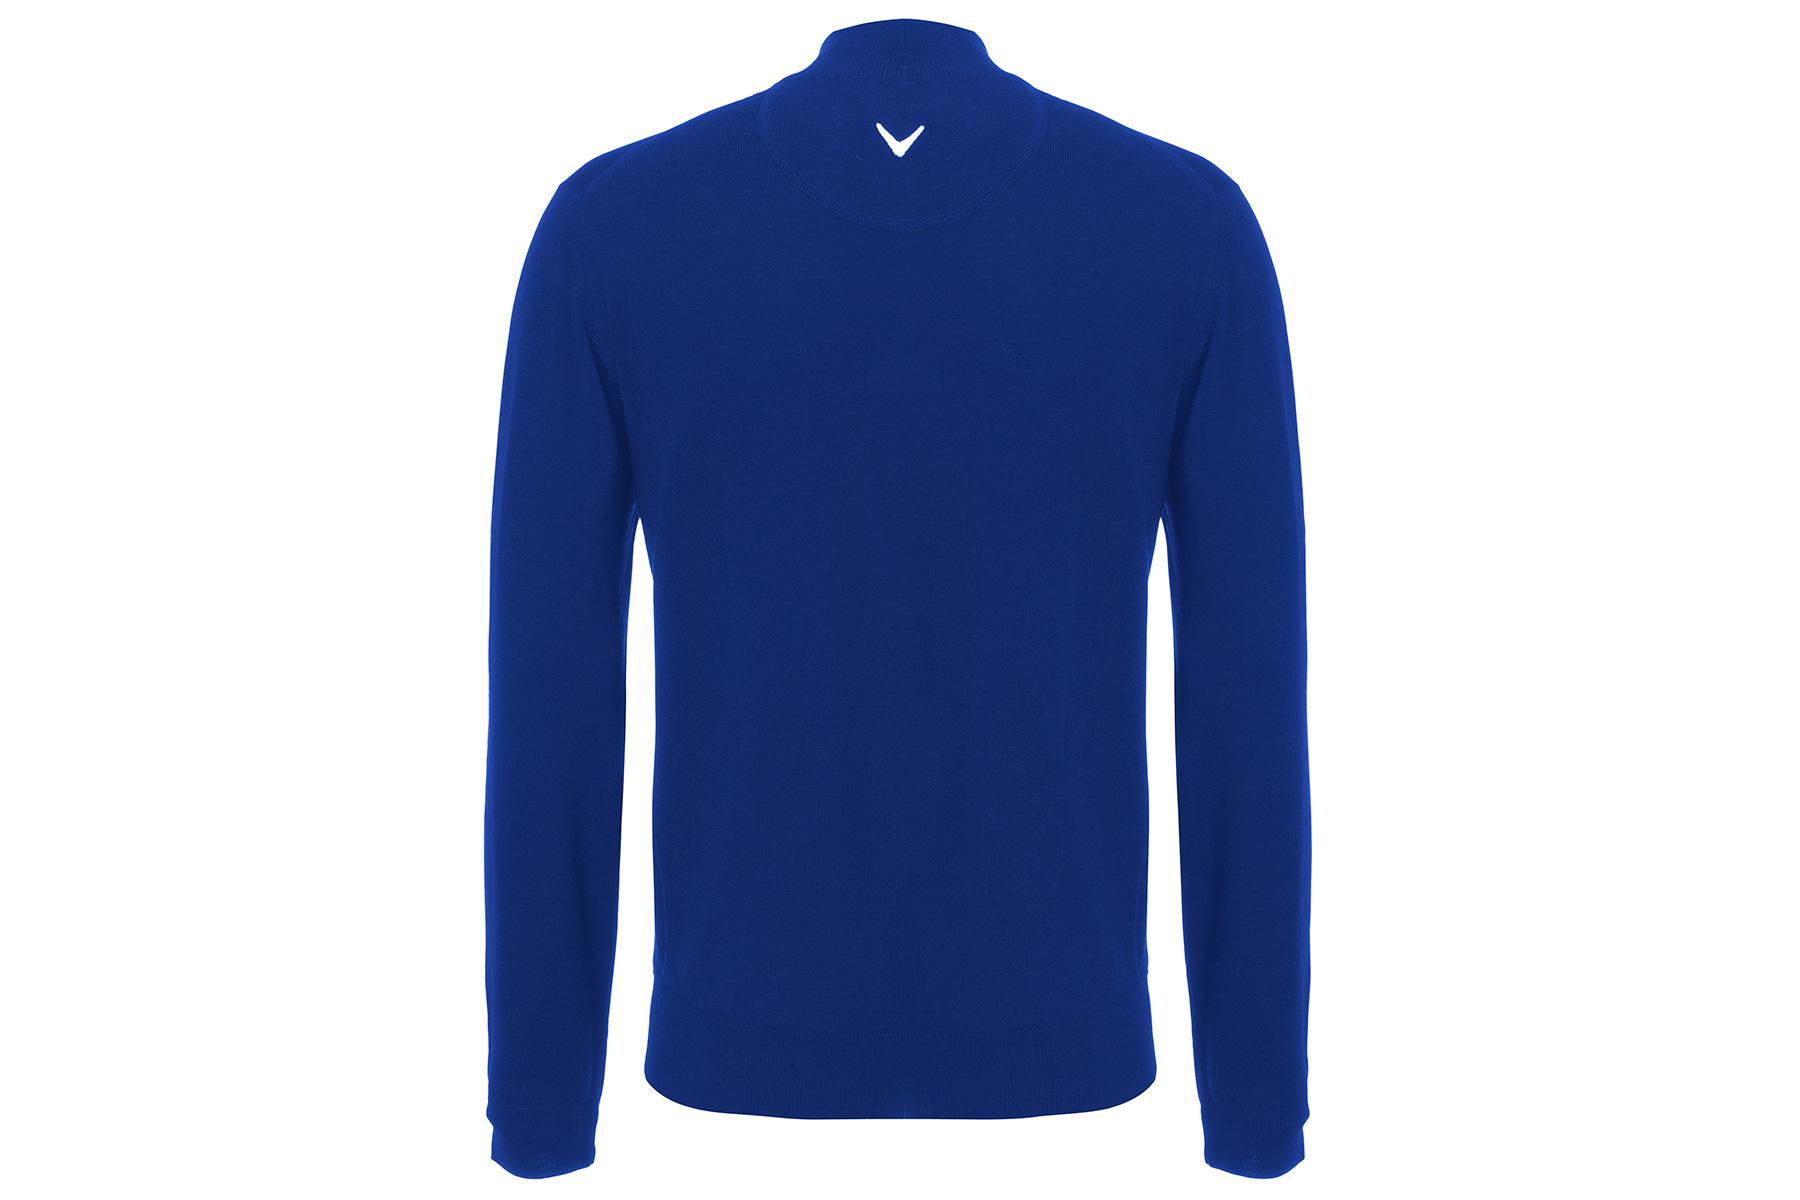 Callaway golf 1 4 zip sweater from american golf for Housse zip collection captur